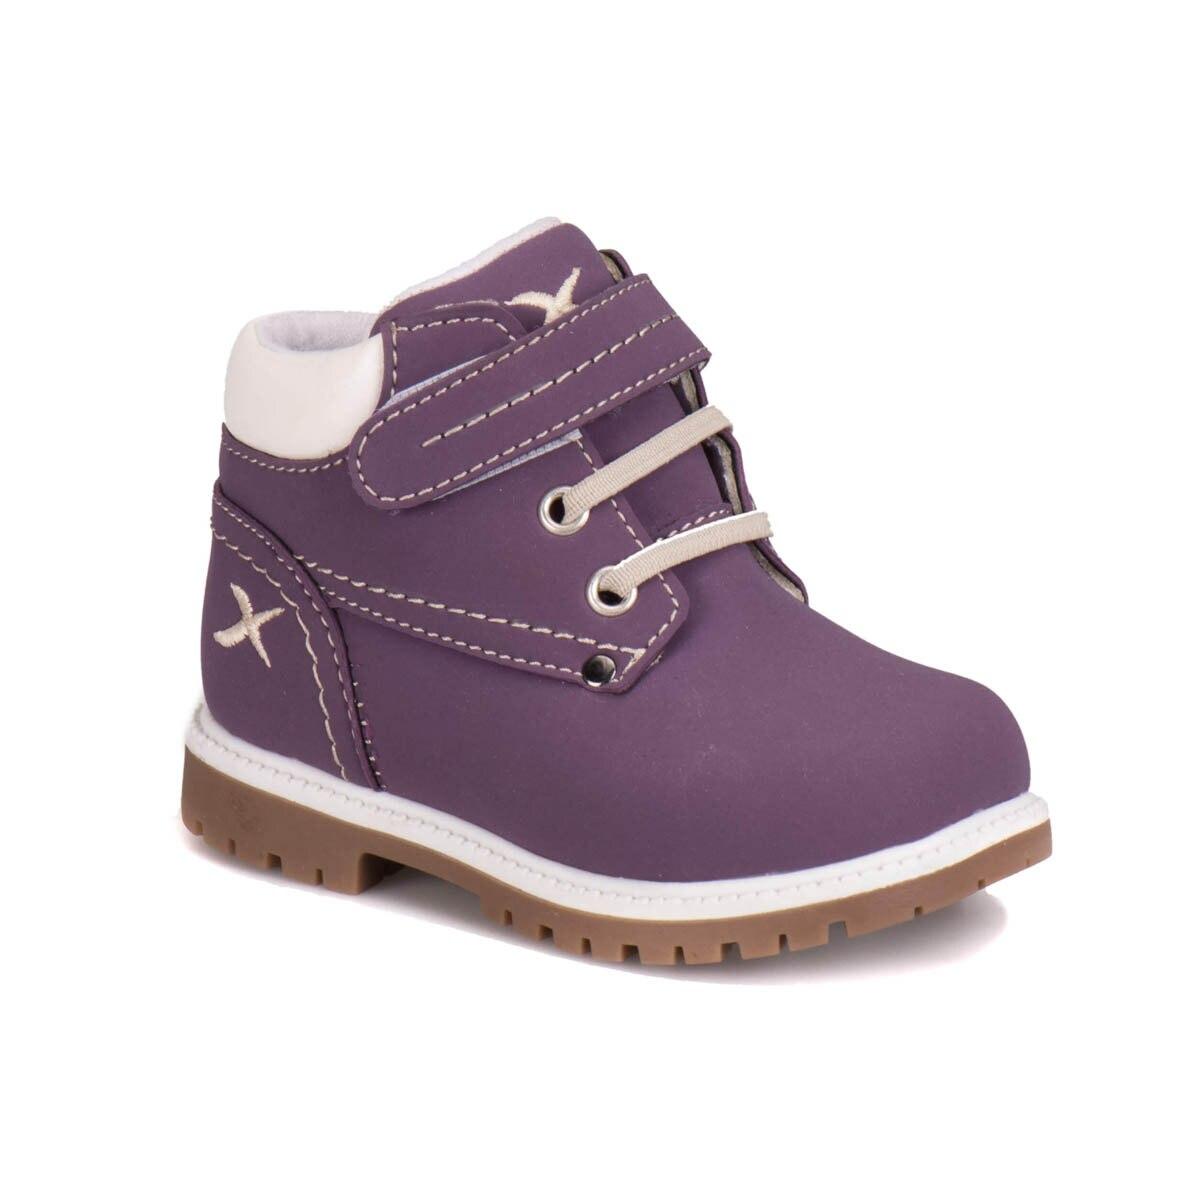 FLO A1317007 Purple Female Child Boots KINETIX